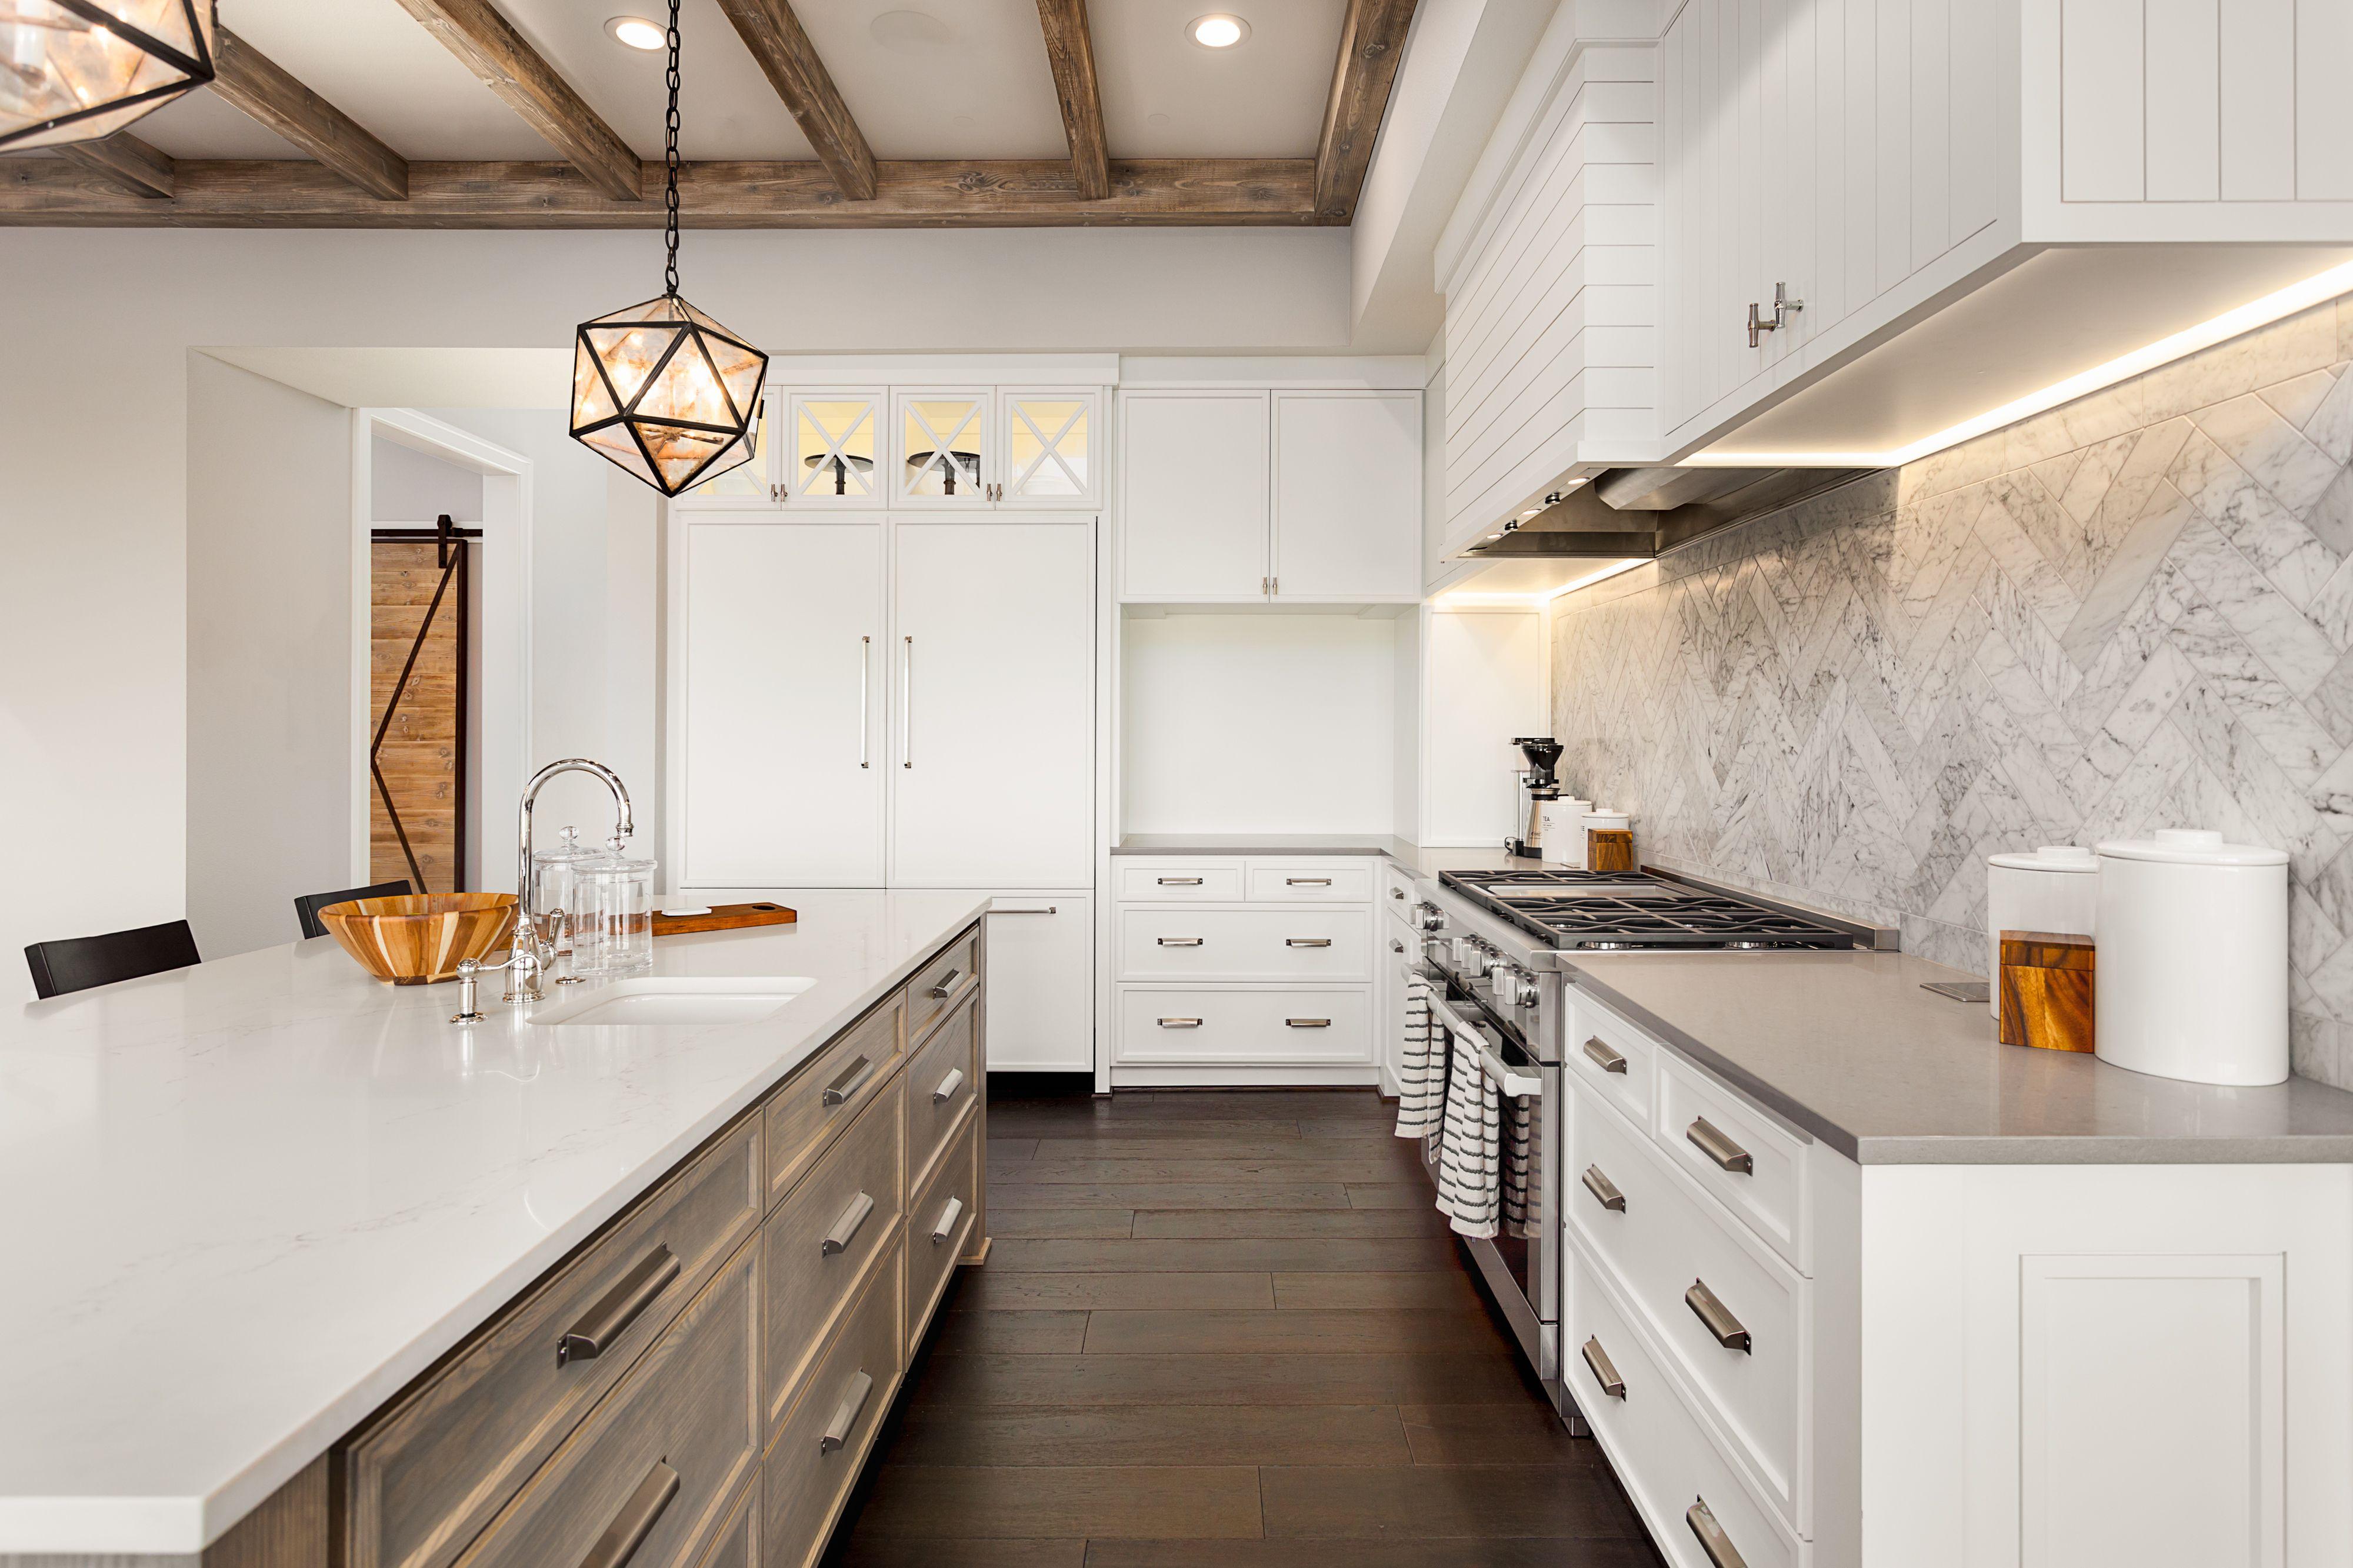 How To Adjust Self Closing Kitchen Cabinet Hinges Hunker Kitchen Backsplash Designs Kitchen Design White Kitchen Design